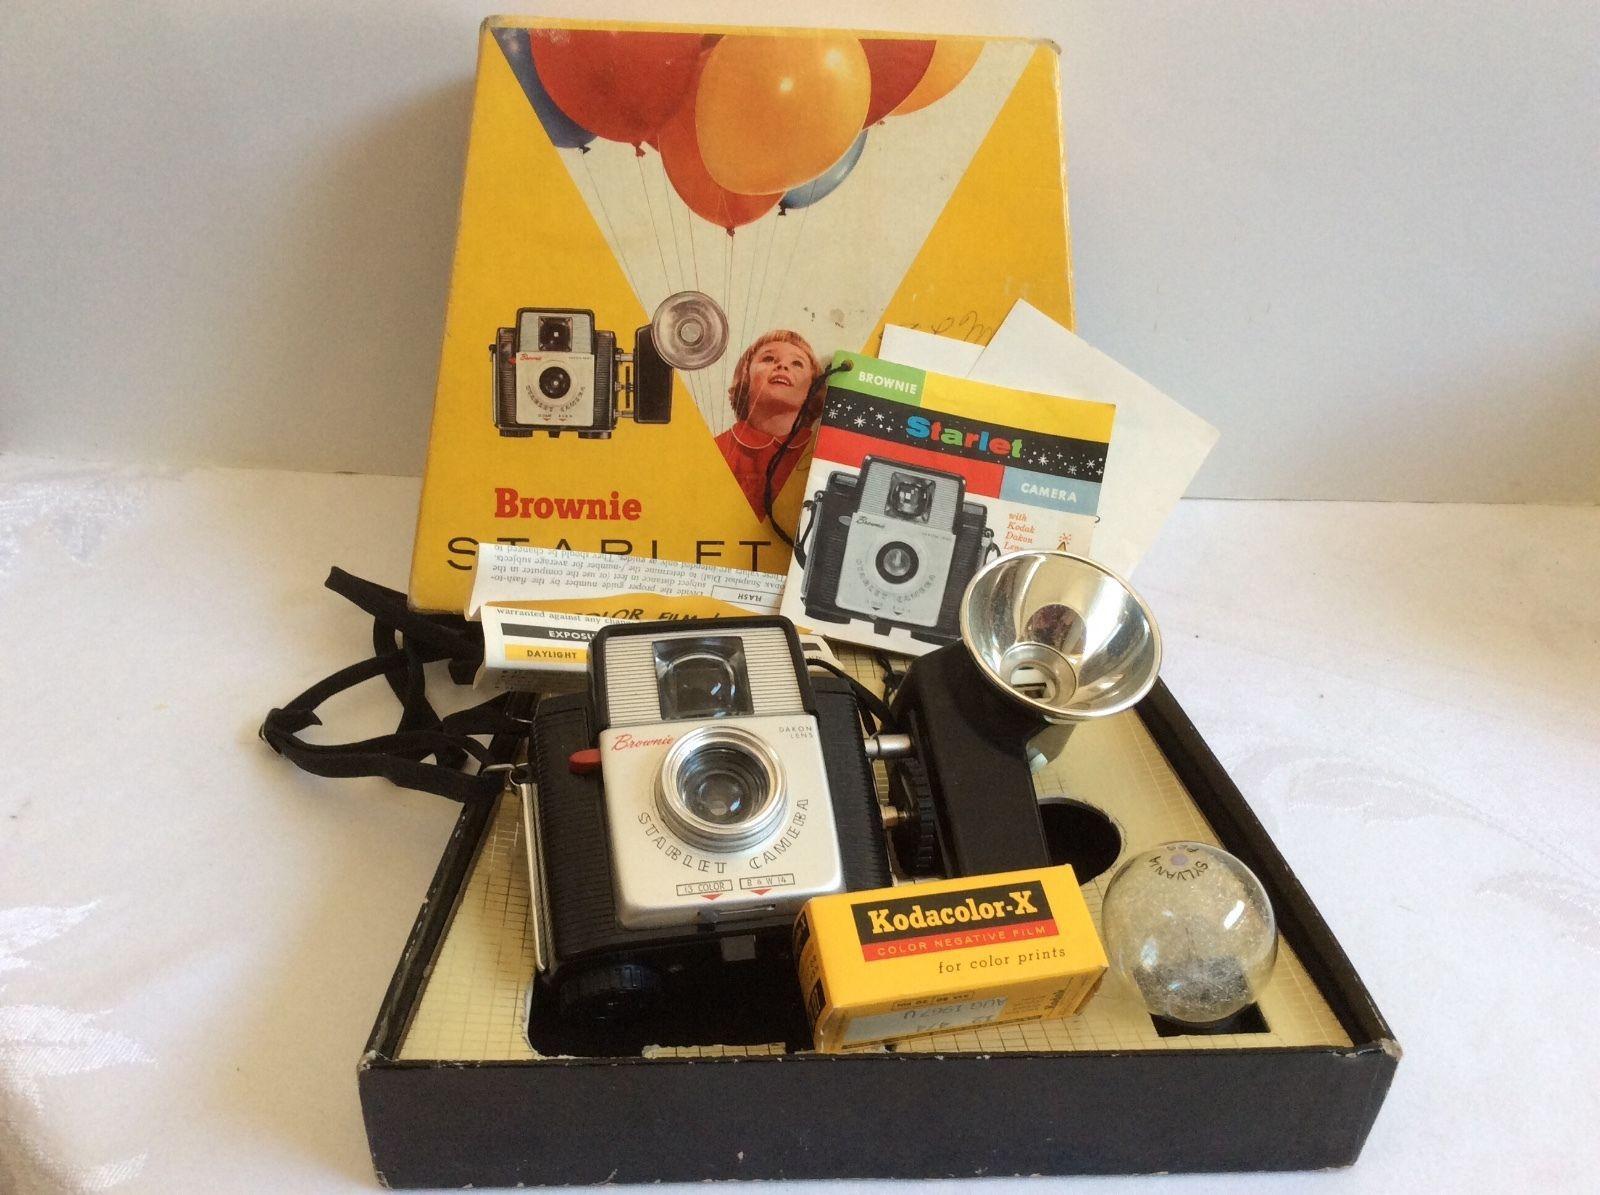 Vtg Kodak Brownie Starlet Camera Outfit No 23e Set Color Film Flash Light Bulb Party Items Color Film Ebay